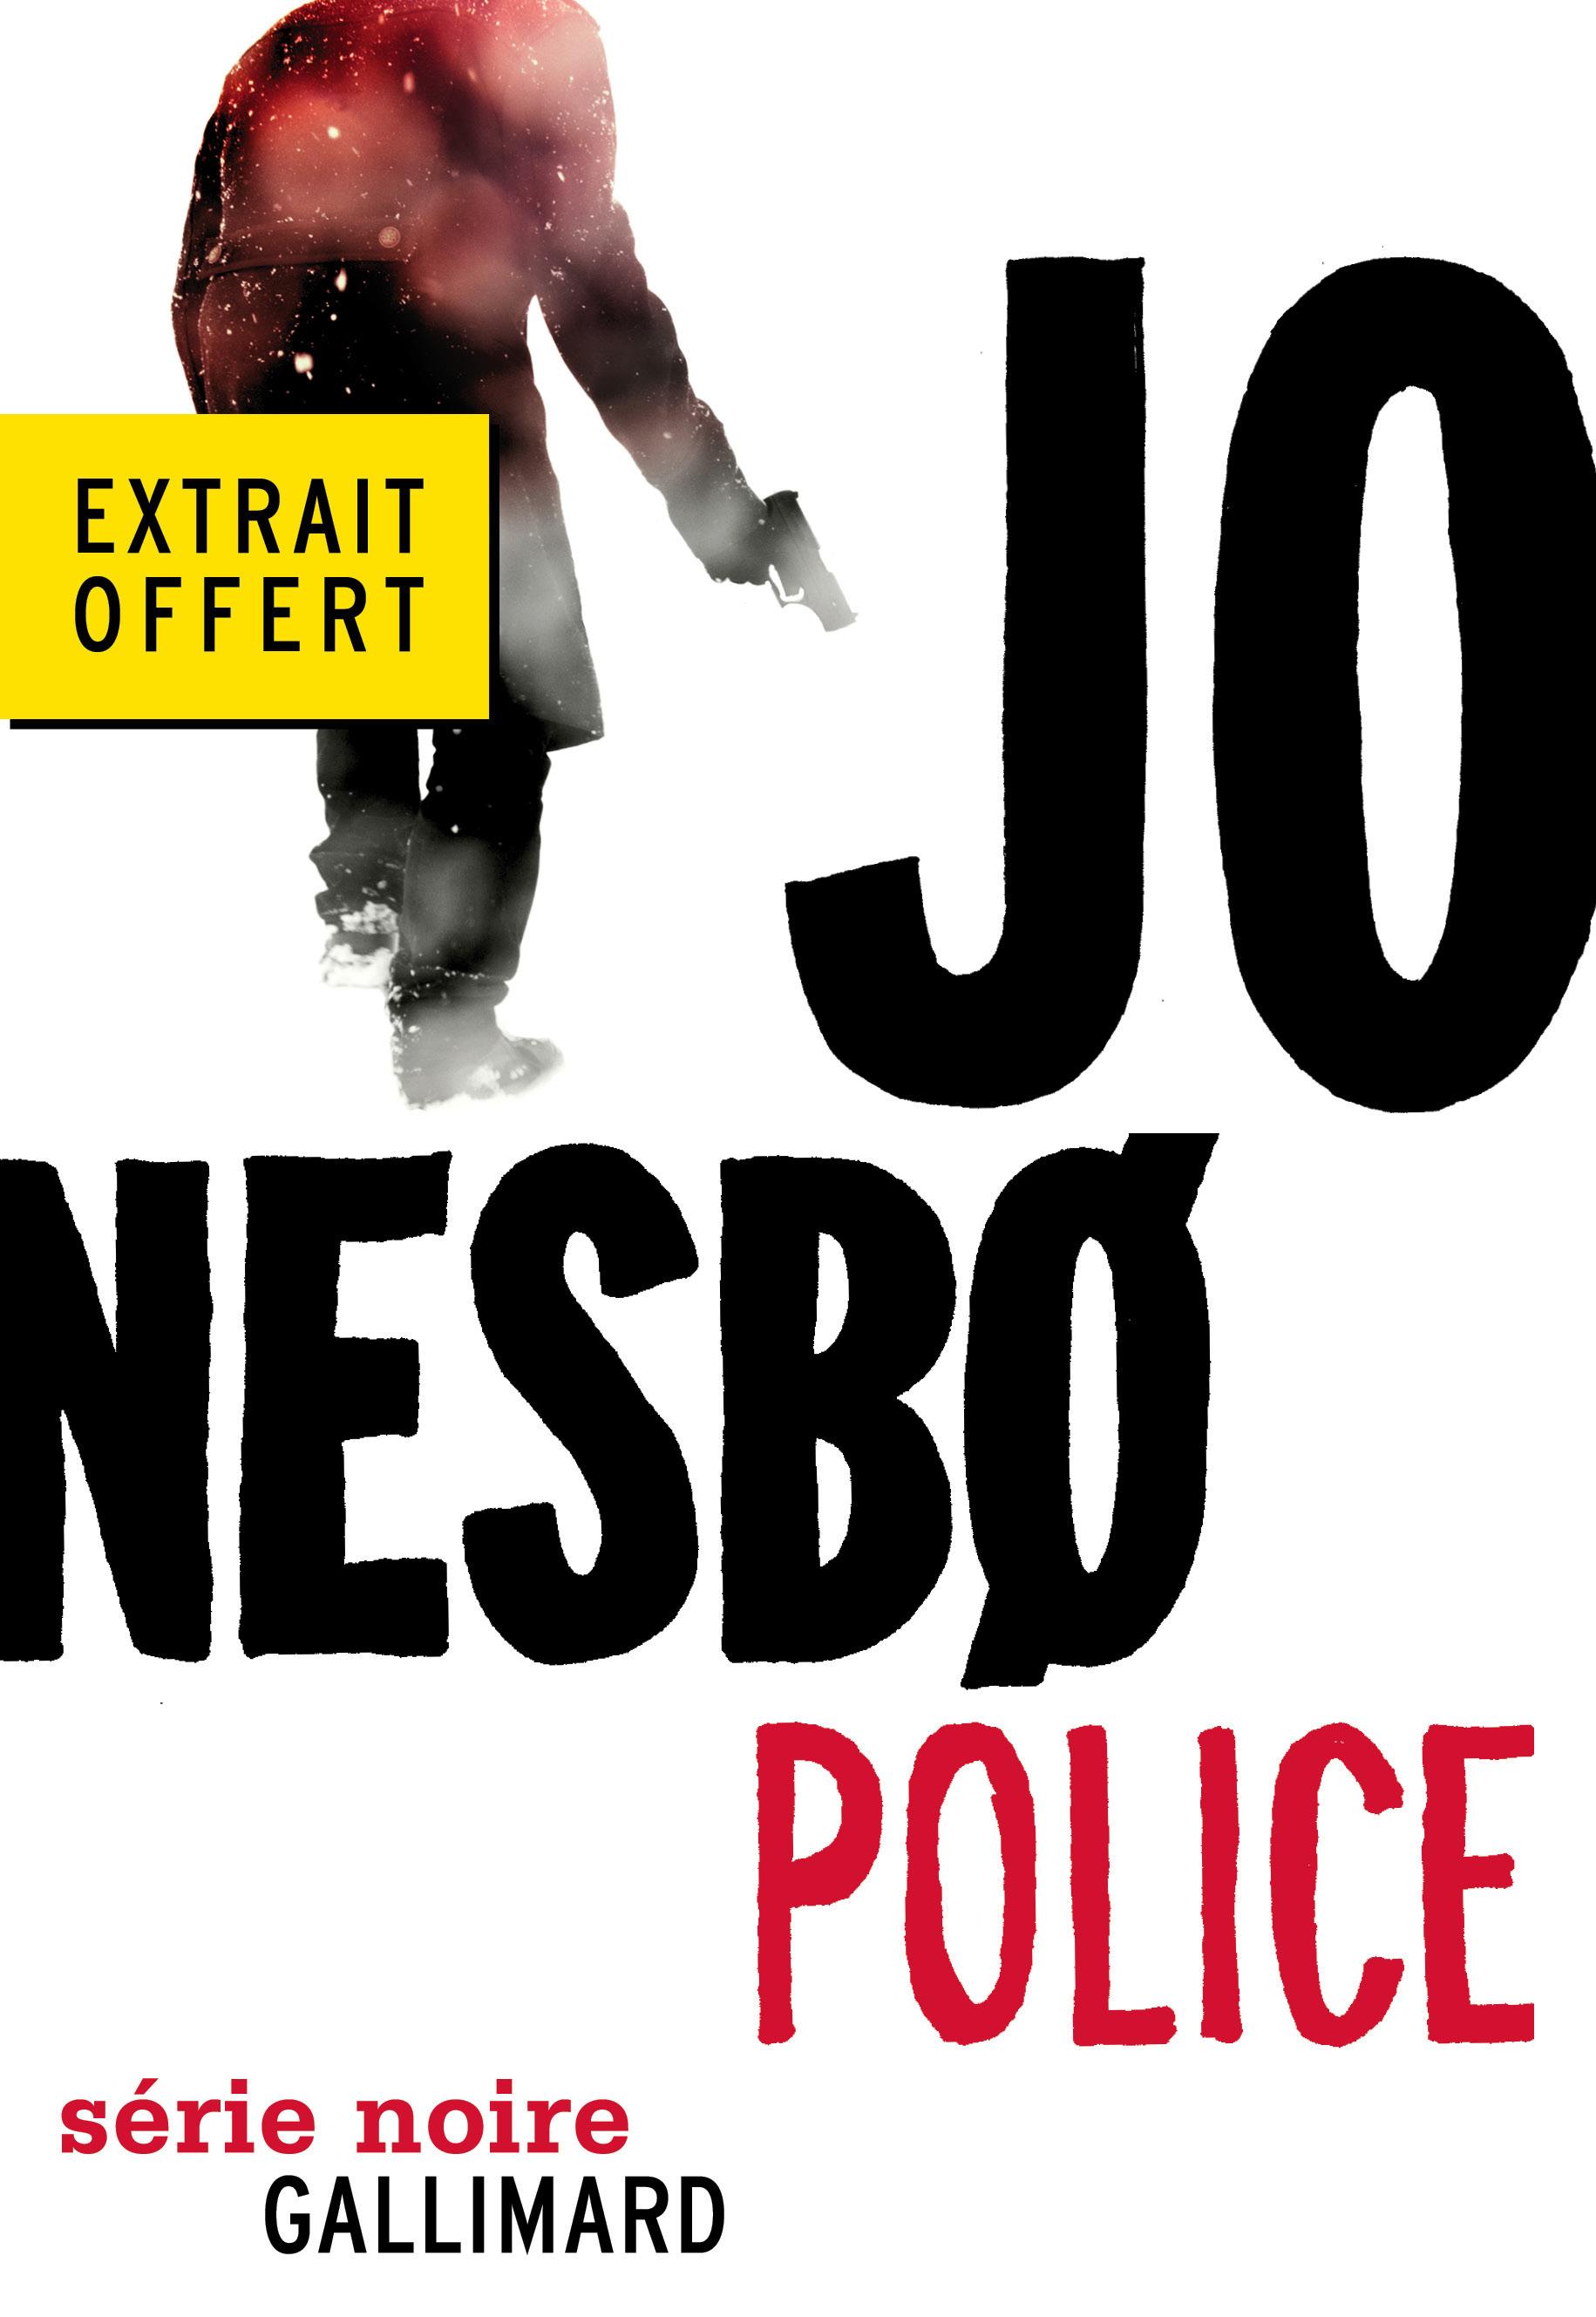 EXTRAIT OFFERT POLICE (L